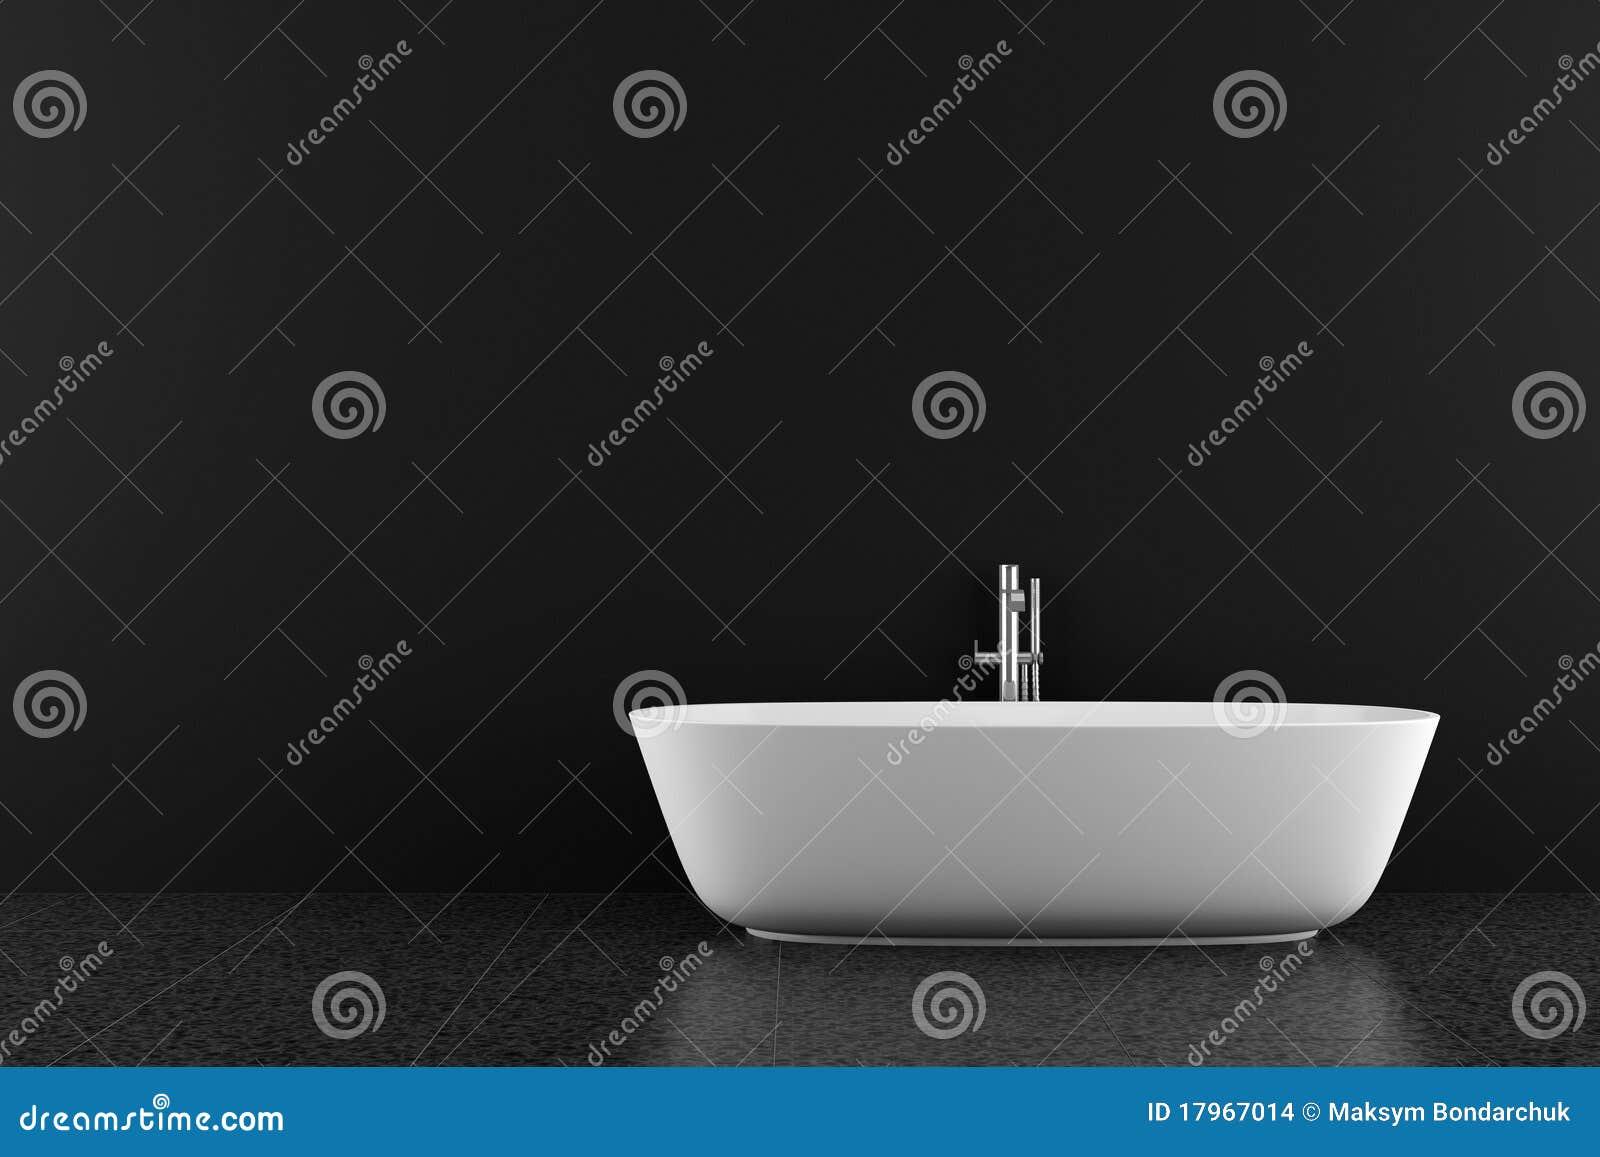 Moderne badkamers met zwarte vloer stock afbeeldingen beeld 17967014 - Plan ouderslaapkamer met badkamer en kleedkamer ...